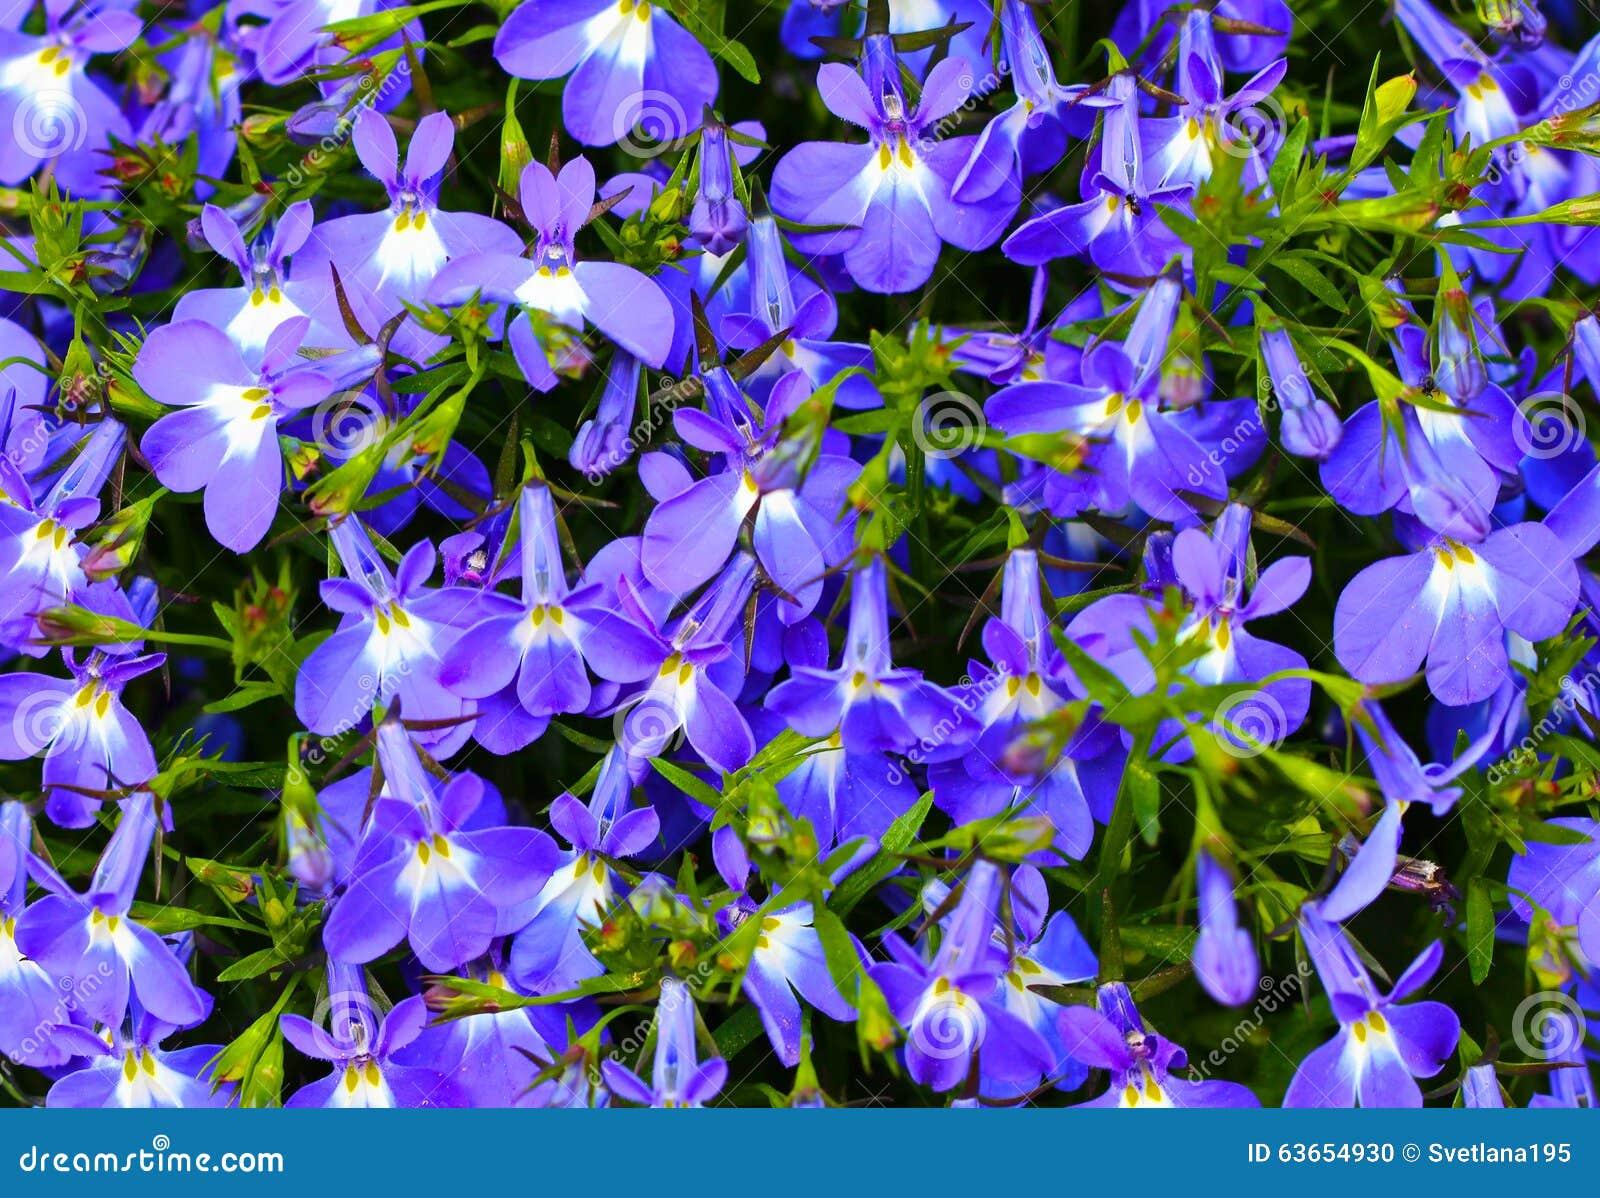 Blue violet flowers background stock photo image of pattern petal download blue violet flowers background stock photo image of pattern petal 63654930 izmirmasajfo